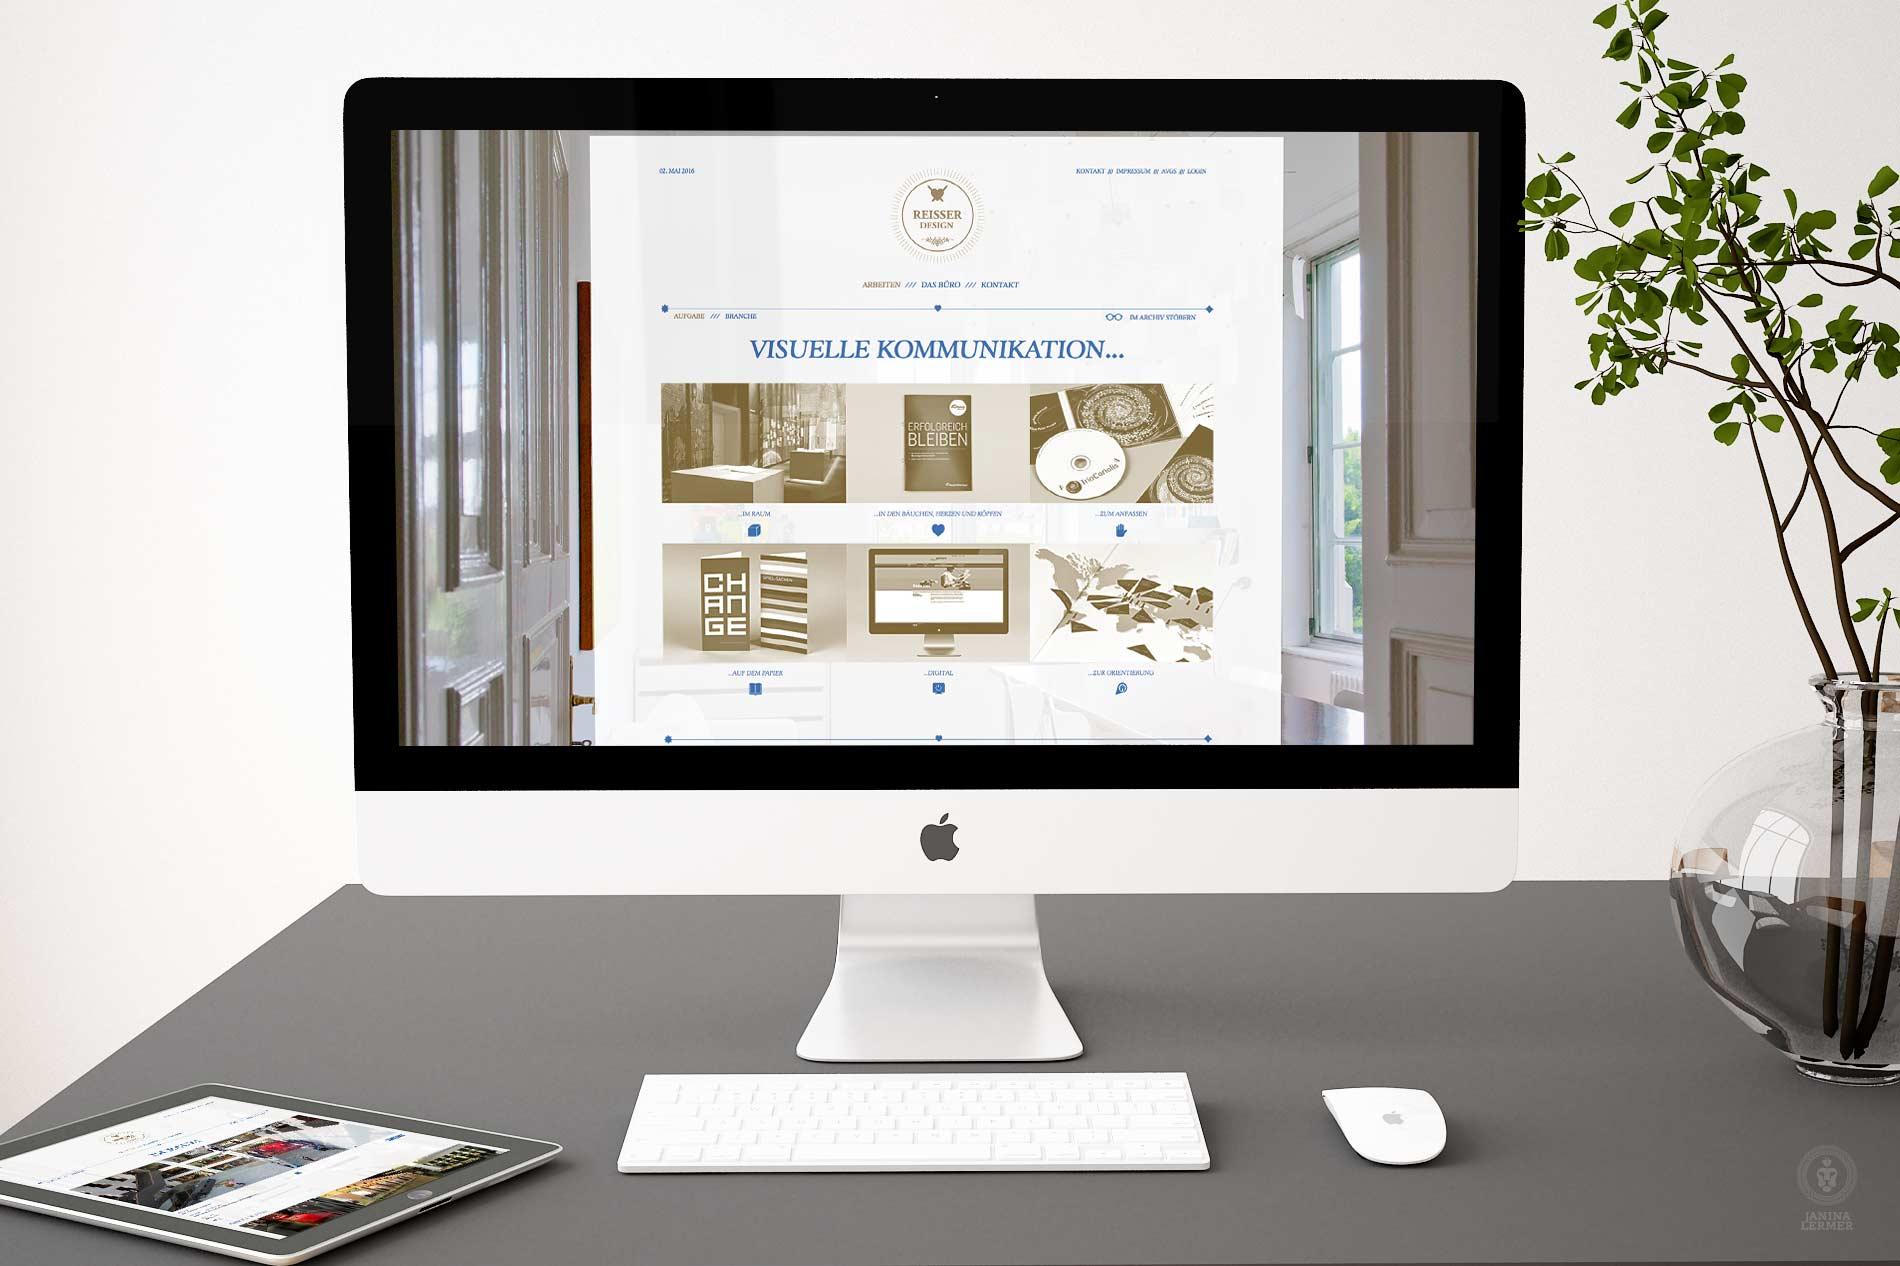 Janina-Lermer-Webseitenkonzept-Webseitengestaltung-Webdesign-Reisserdesign-Projekte-Projects